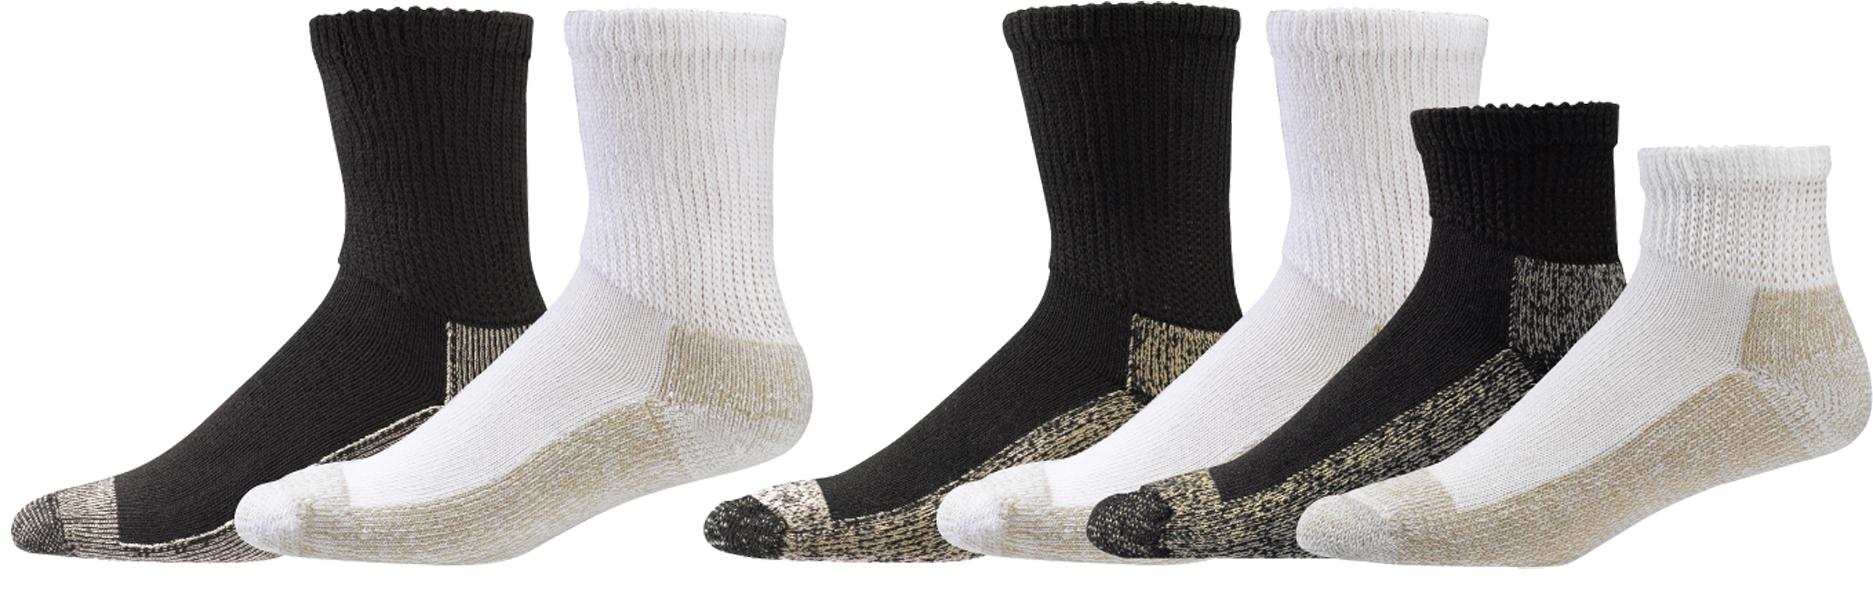 Aetrex Copper Socks 2.jpg